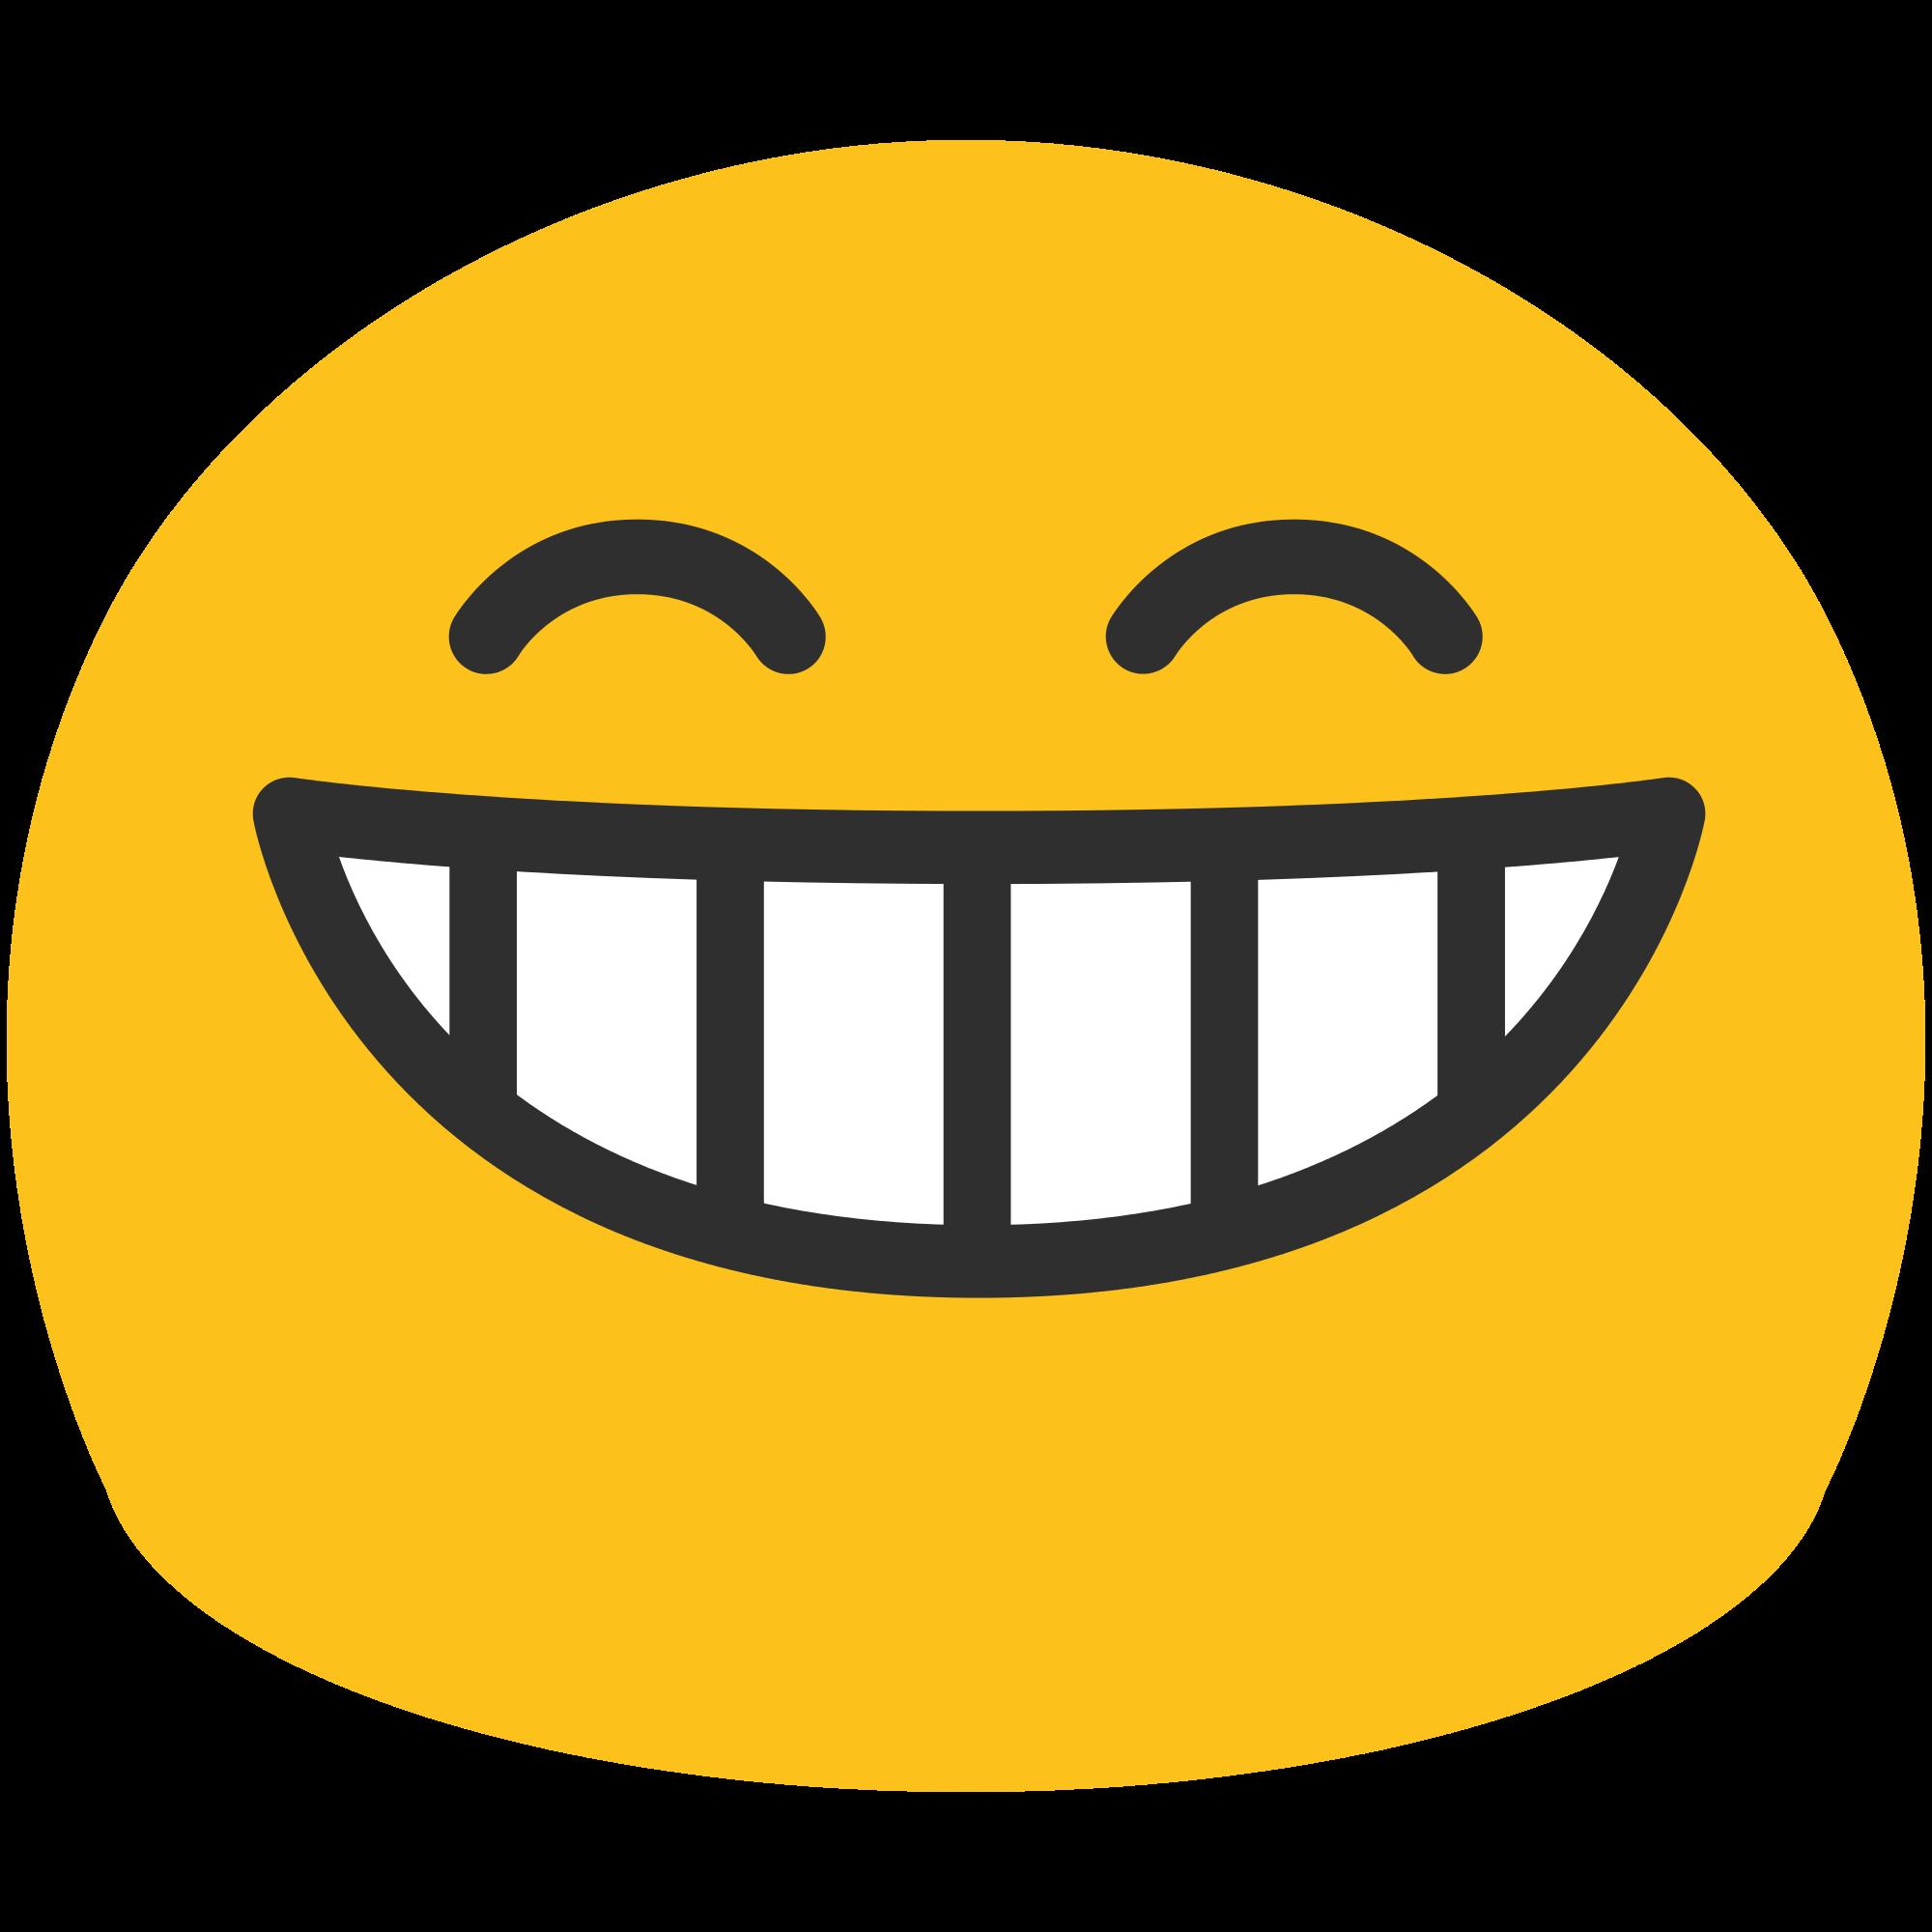 Smiley Looking Happy Png Image Cat Face Smiling Eyes Emoji